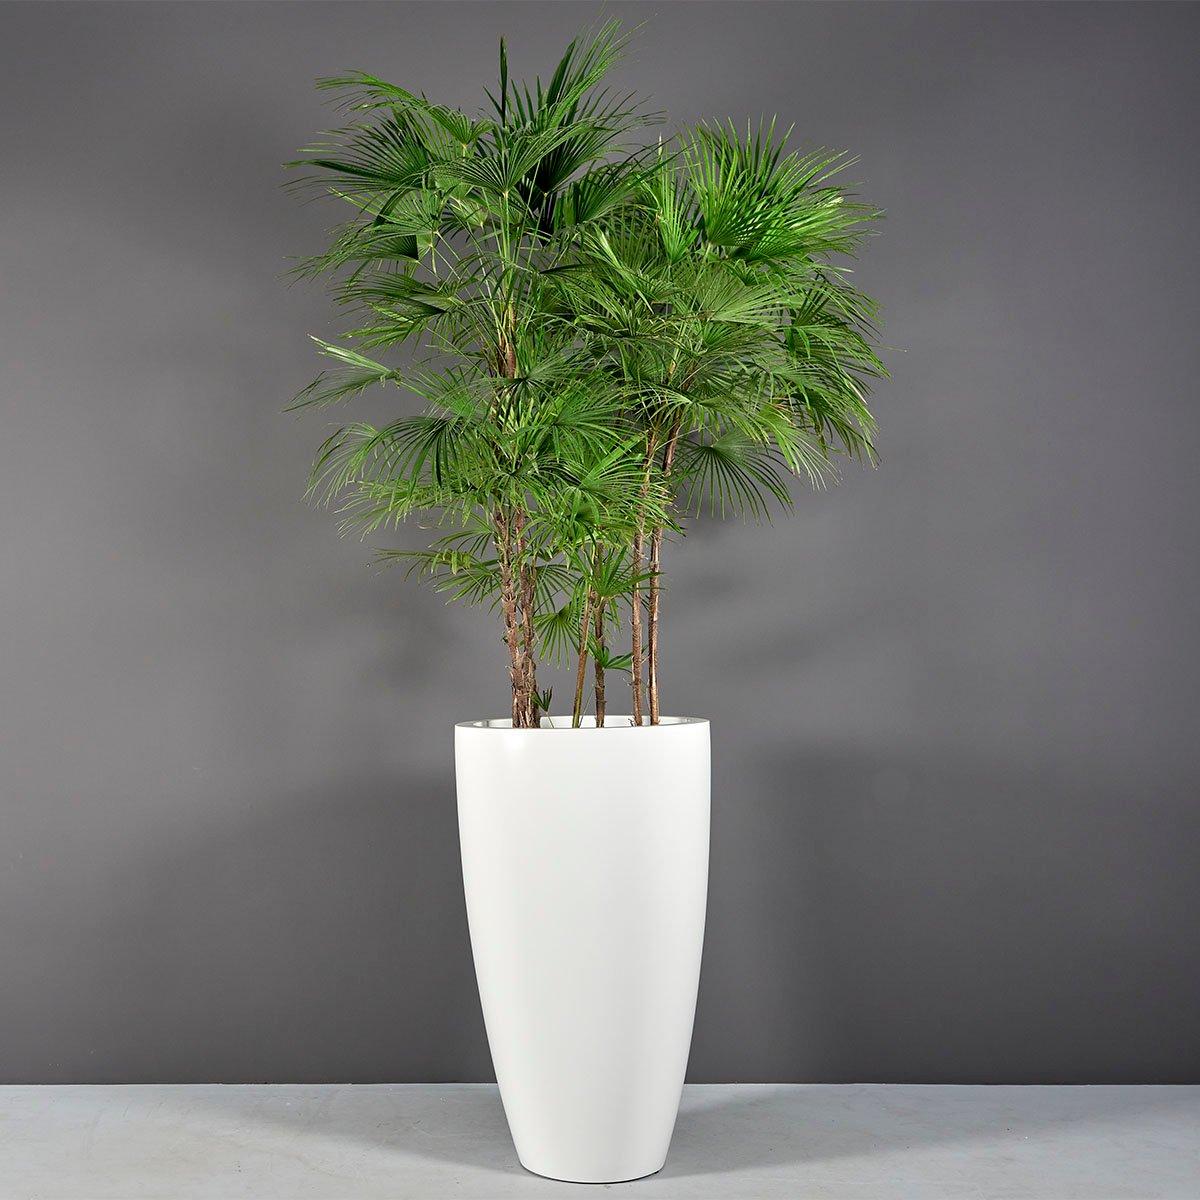 Peypin Tall Extra Large Round Planter